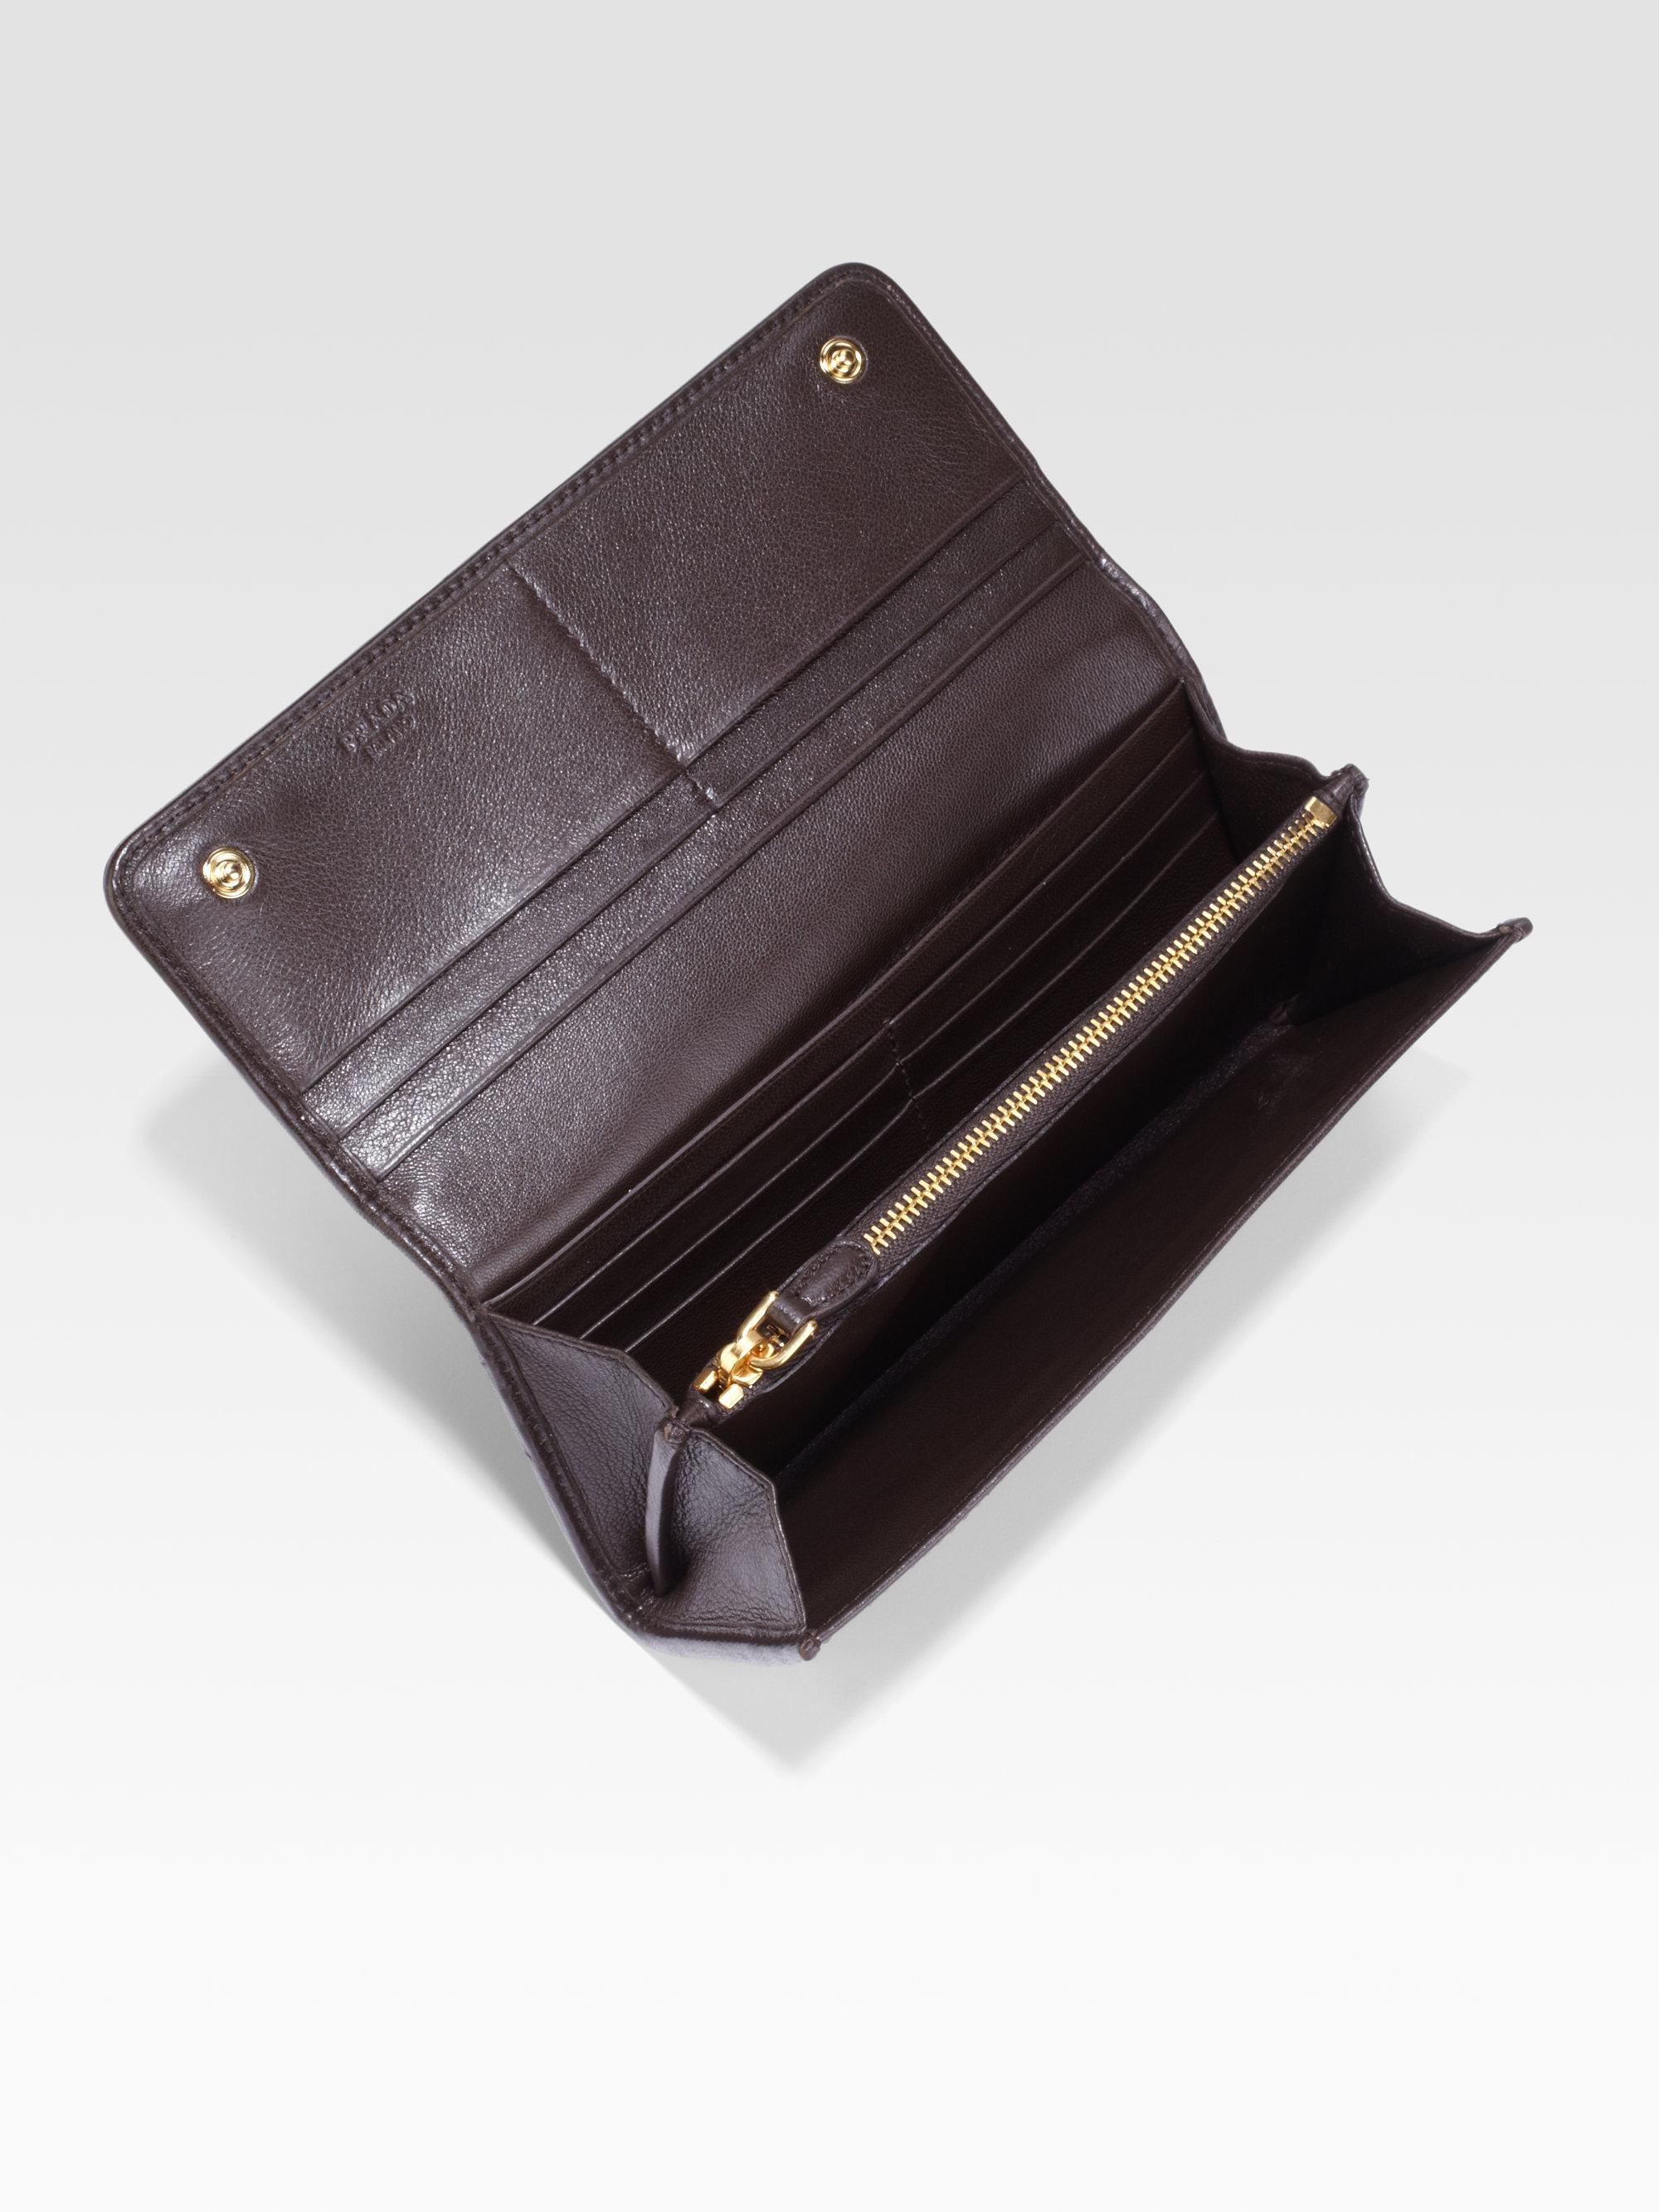 08300e2191cb ... discount code for lyst prada cavallino haircalf continental wallet  d04ce 54d74